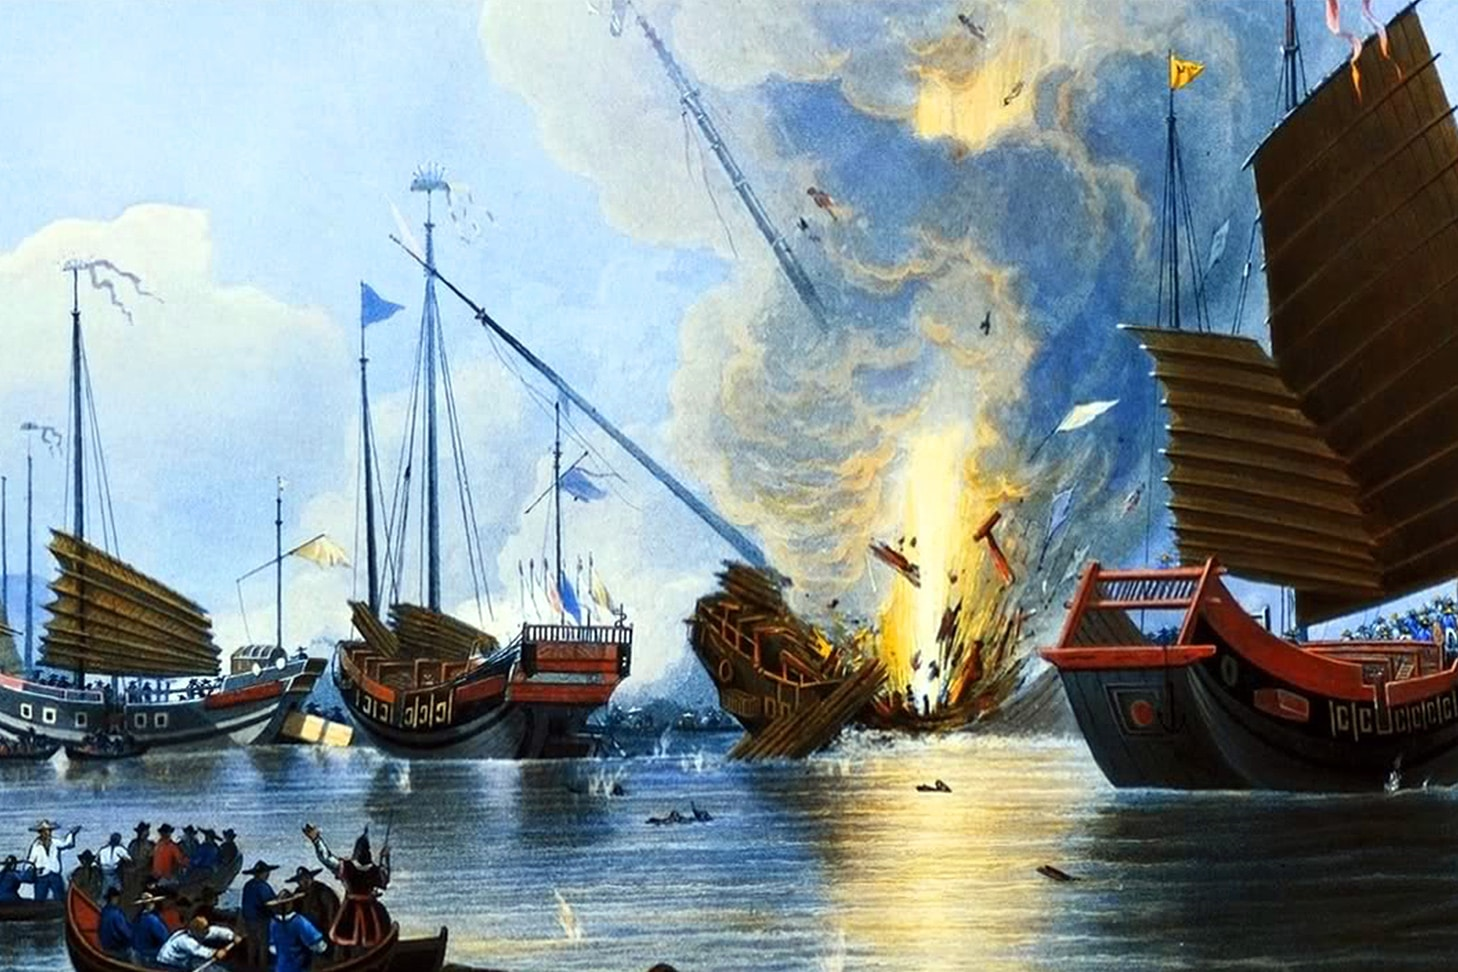 ActionFliks 9 Dragons Tea China Tea Trade British Opium War Bridgeman The Steamer Nemesis Destroying Chinese War Junks in the Canton River c1842